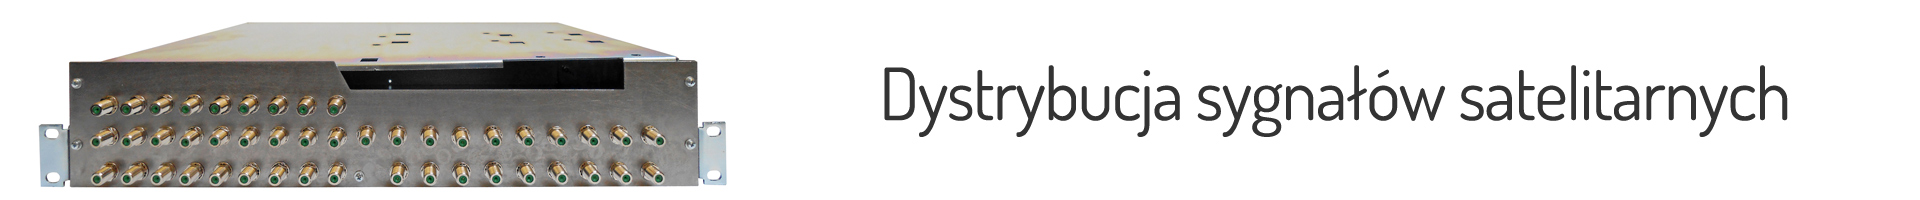 SLIDER_Dystrybucja_sygnalow_satelitarnych_d